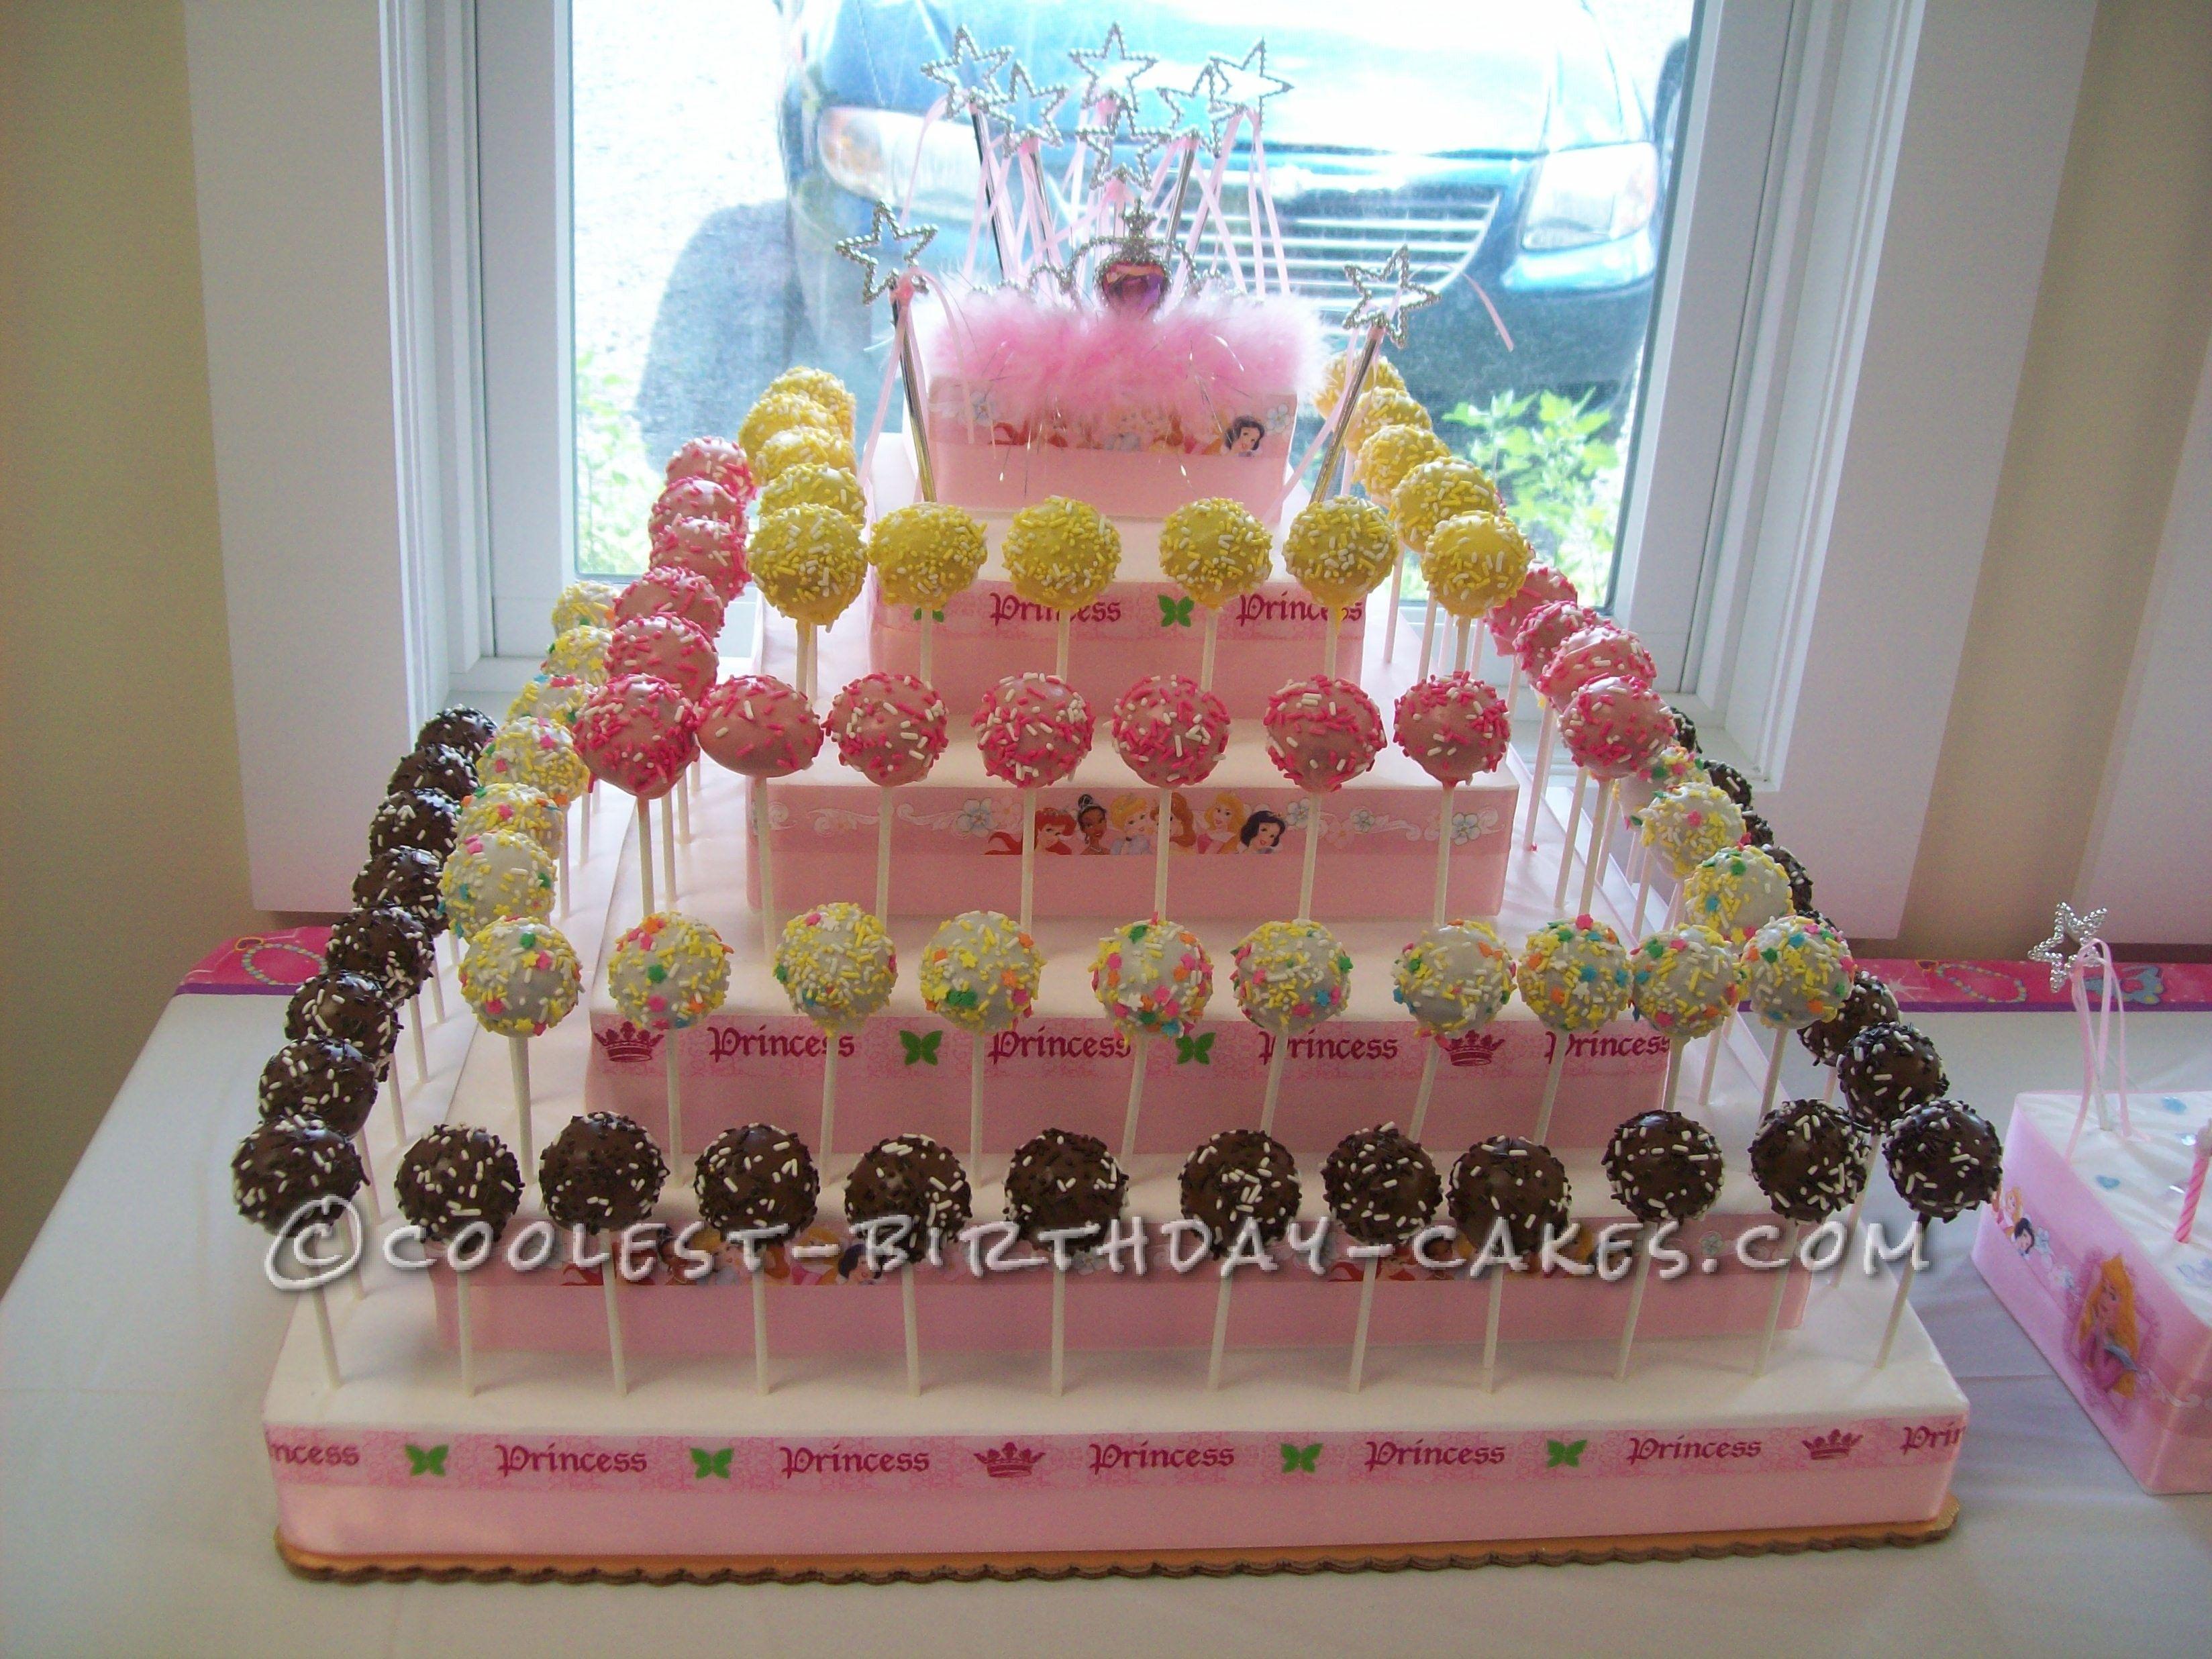 Coolest Disney Princess Cake Pops Princess Cake Pops Cake Pop - Cake pop birthday cake